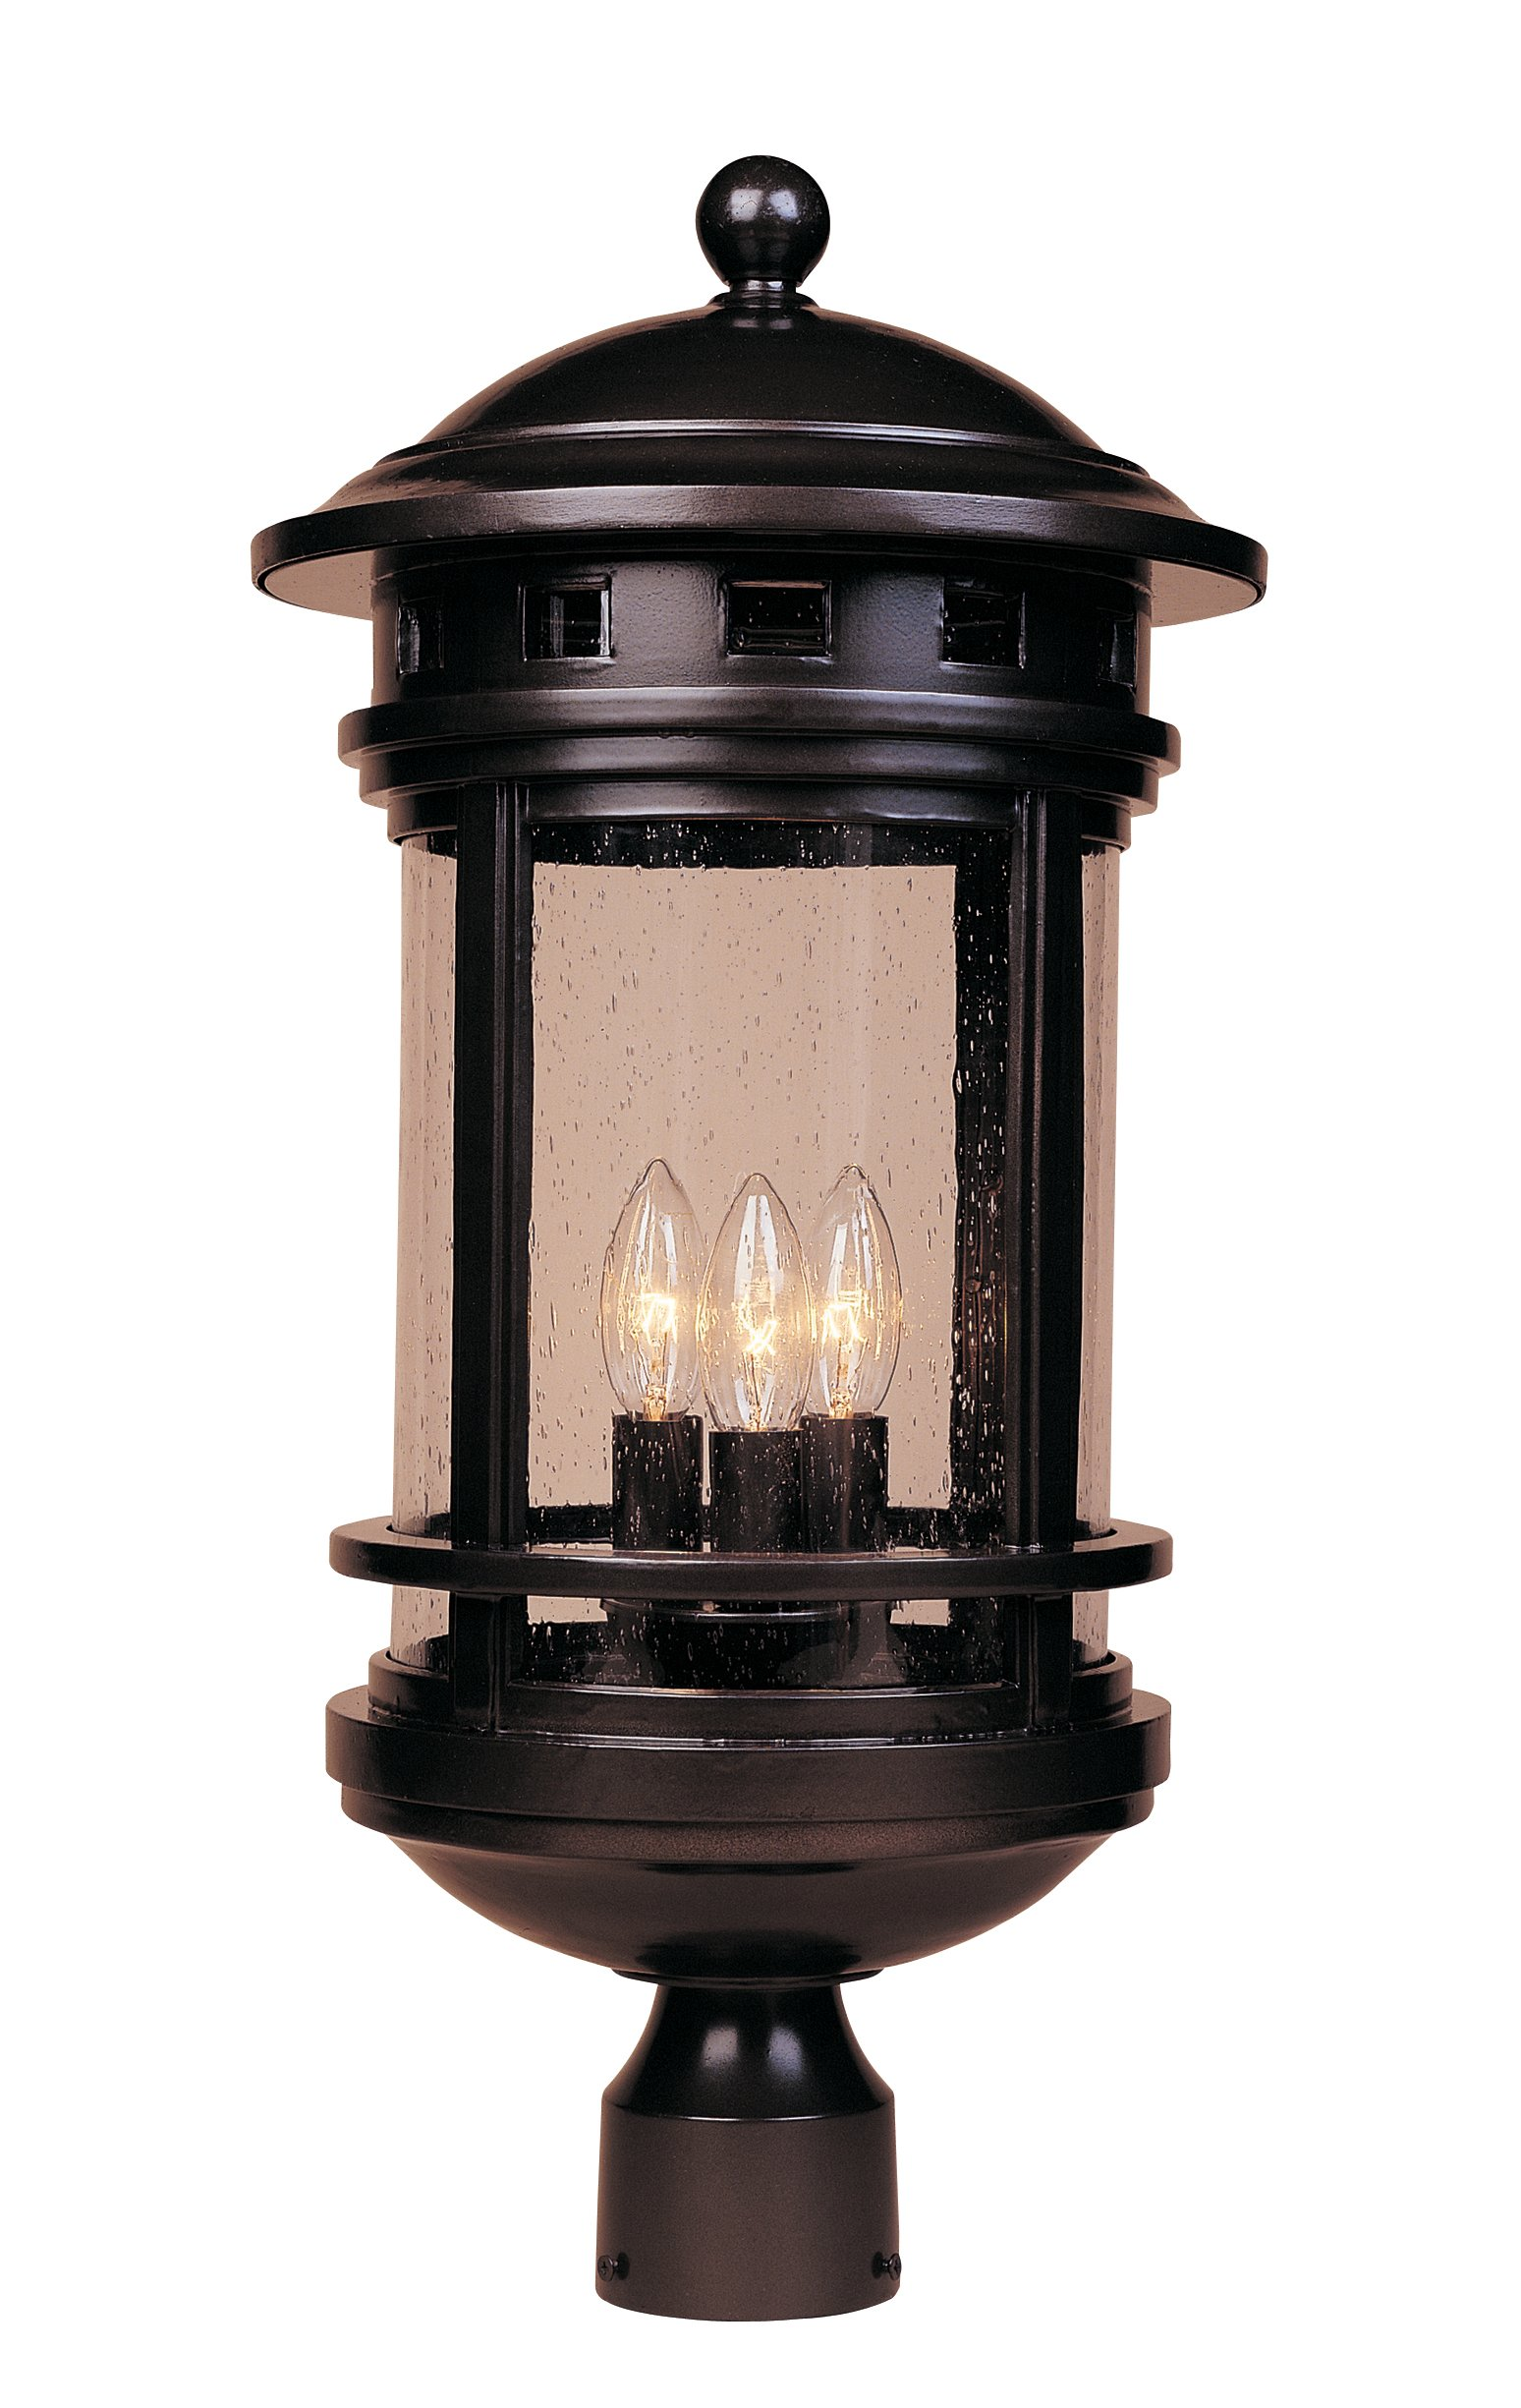 Designers Fountain 2396-ORB Sedona Post Lanterns, Oil Rubbed Bronze by Designers Fountain